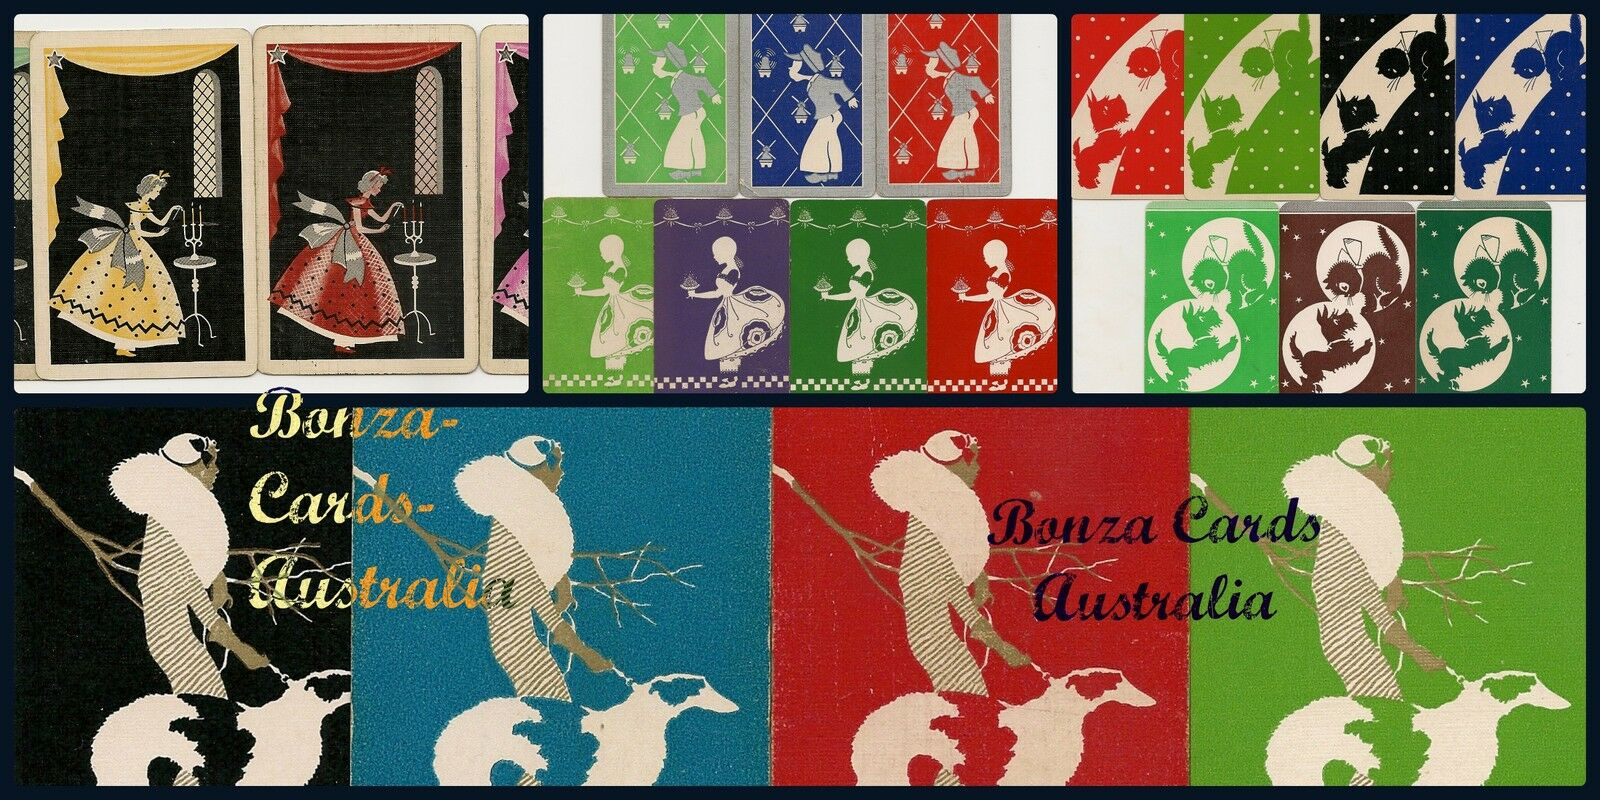 bonza-cards-australia